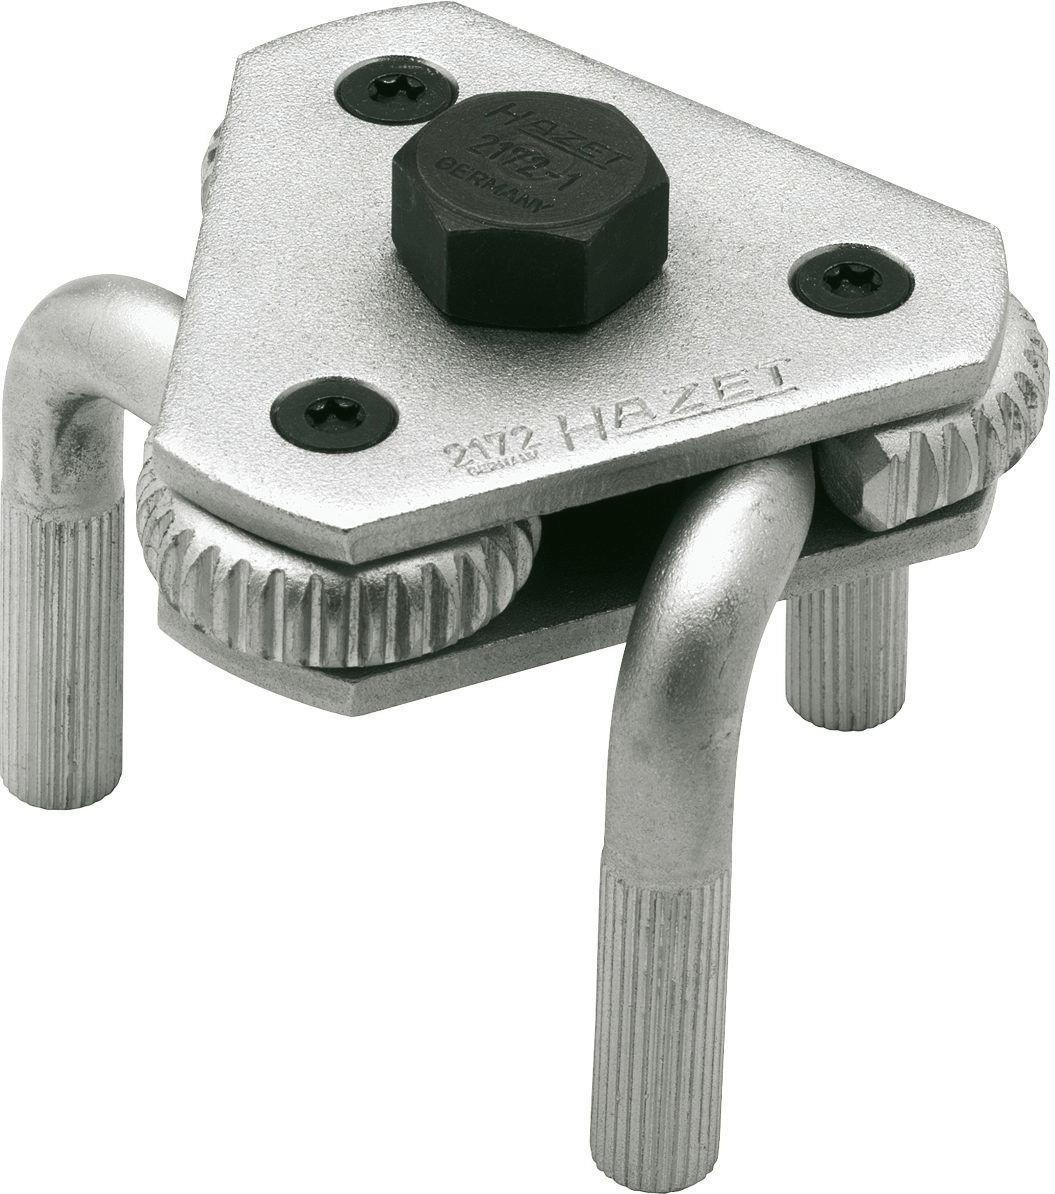 Hazet Ölfilter-Schlüssel 2172